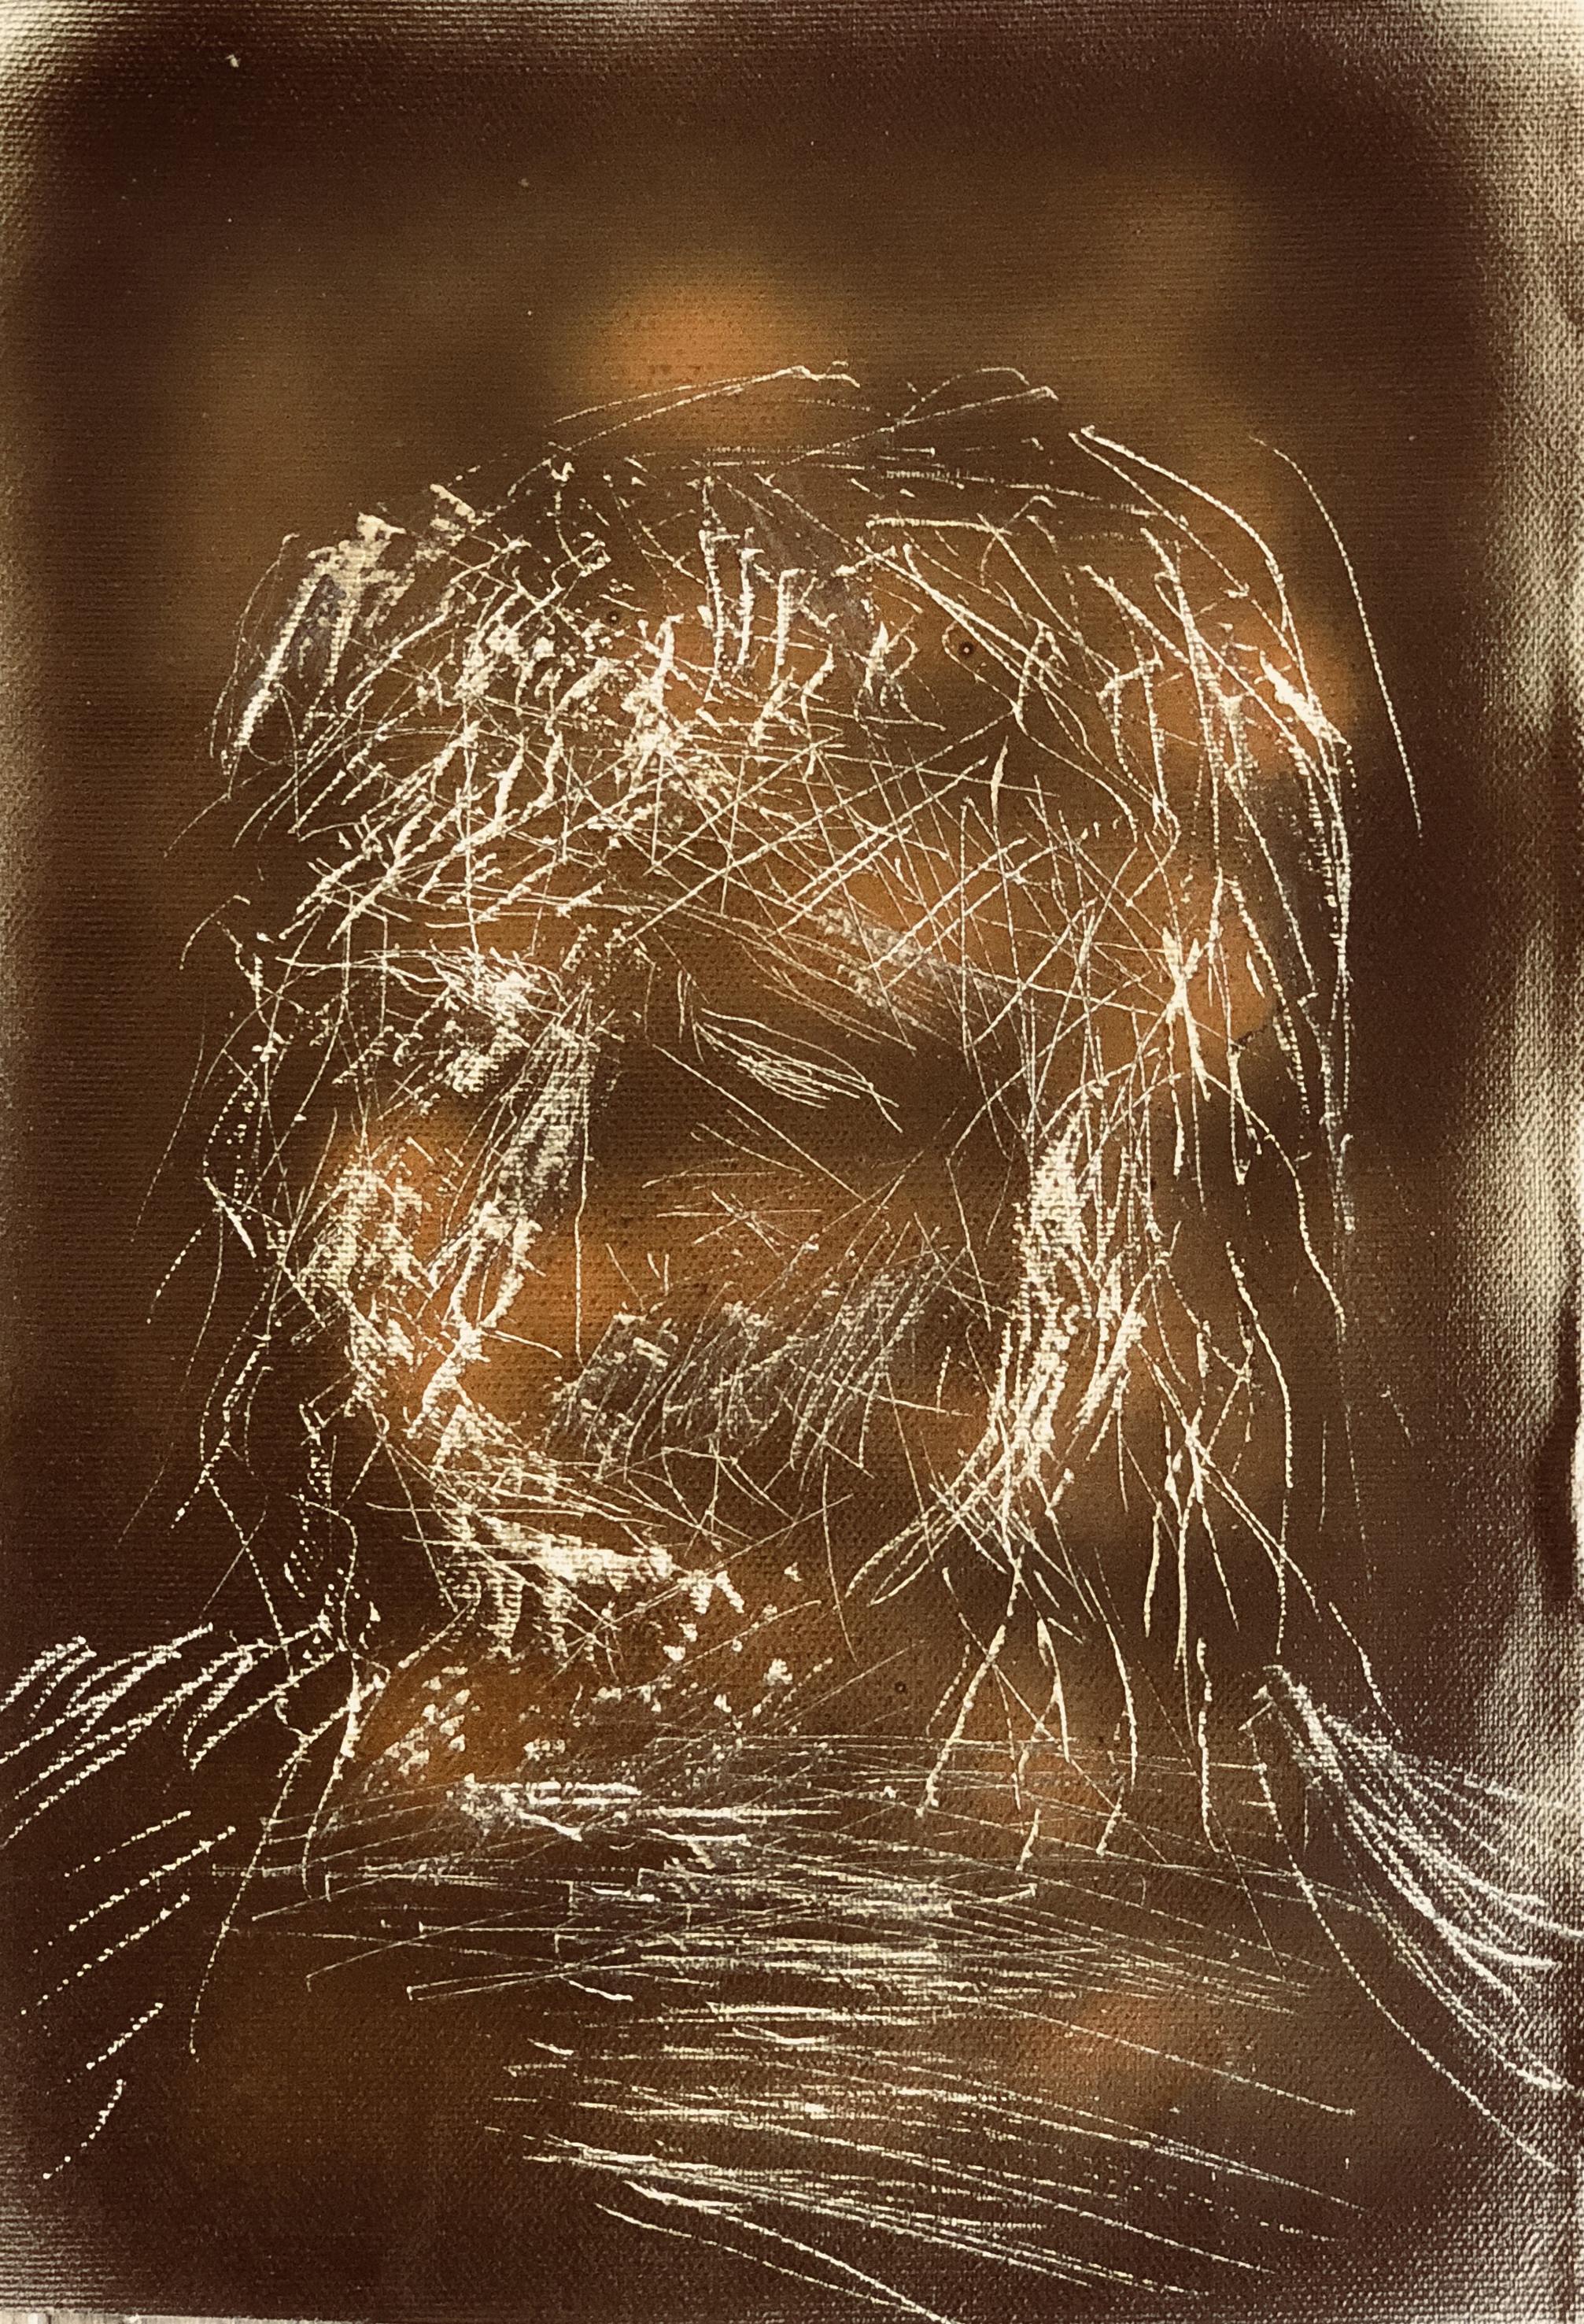 1) Marco Biscardi - Adult - 2018 - 24x34 cm - Acrylic on canvas.jpg